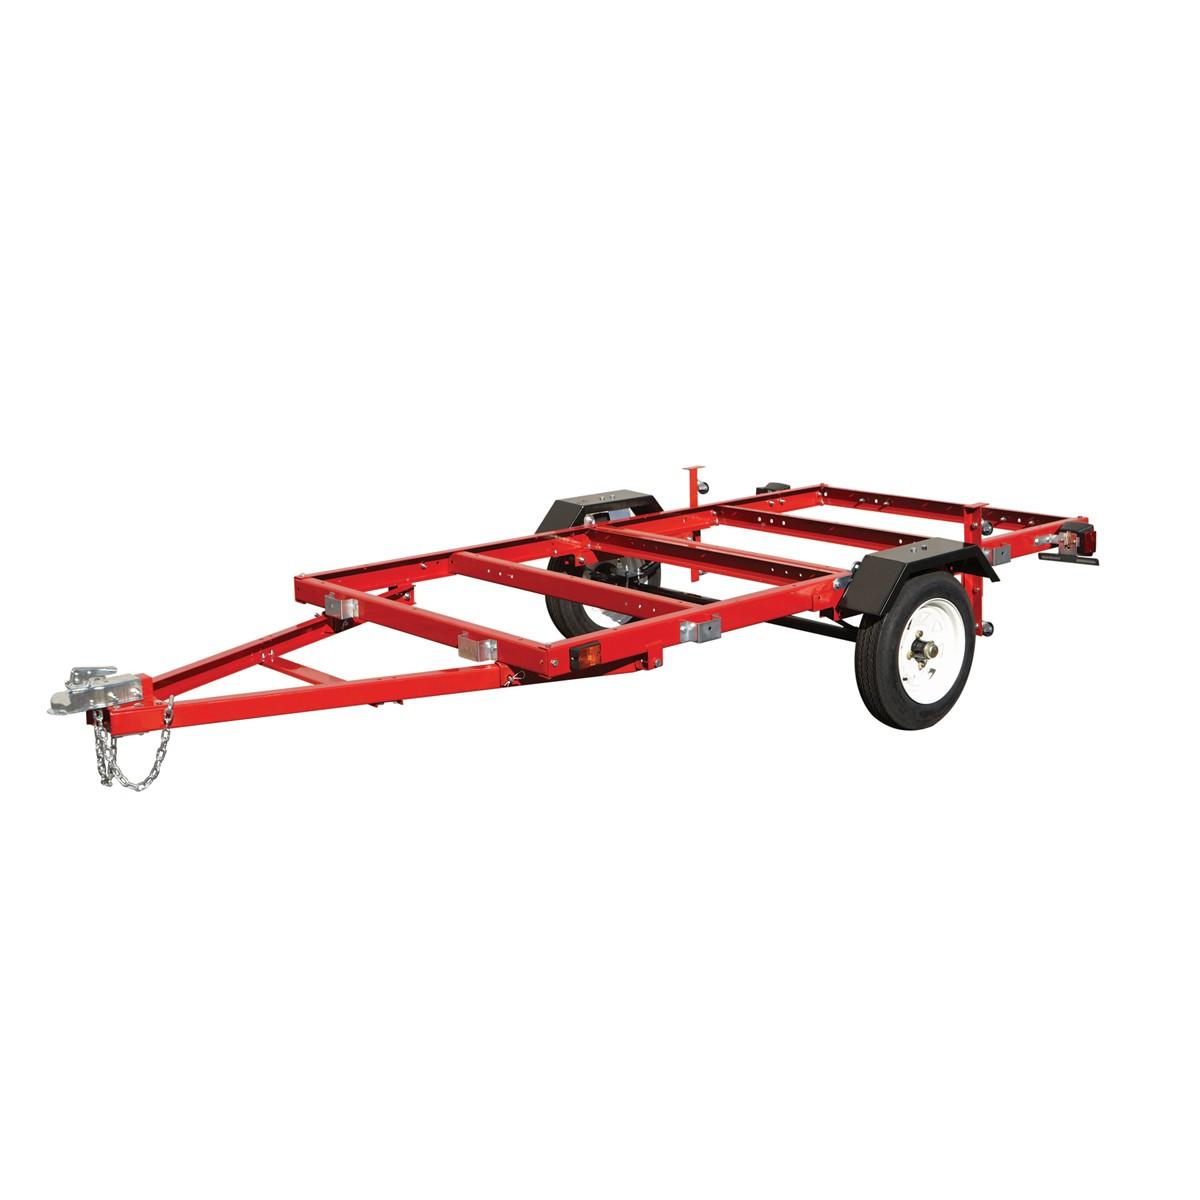 4' x 8' 1195 lb. Capacity Heavy Duty Folding Utility Trailer $224.99(+tax) AC B&M - Harbor Freight Hools